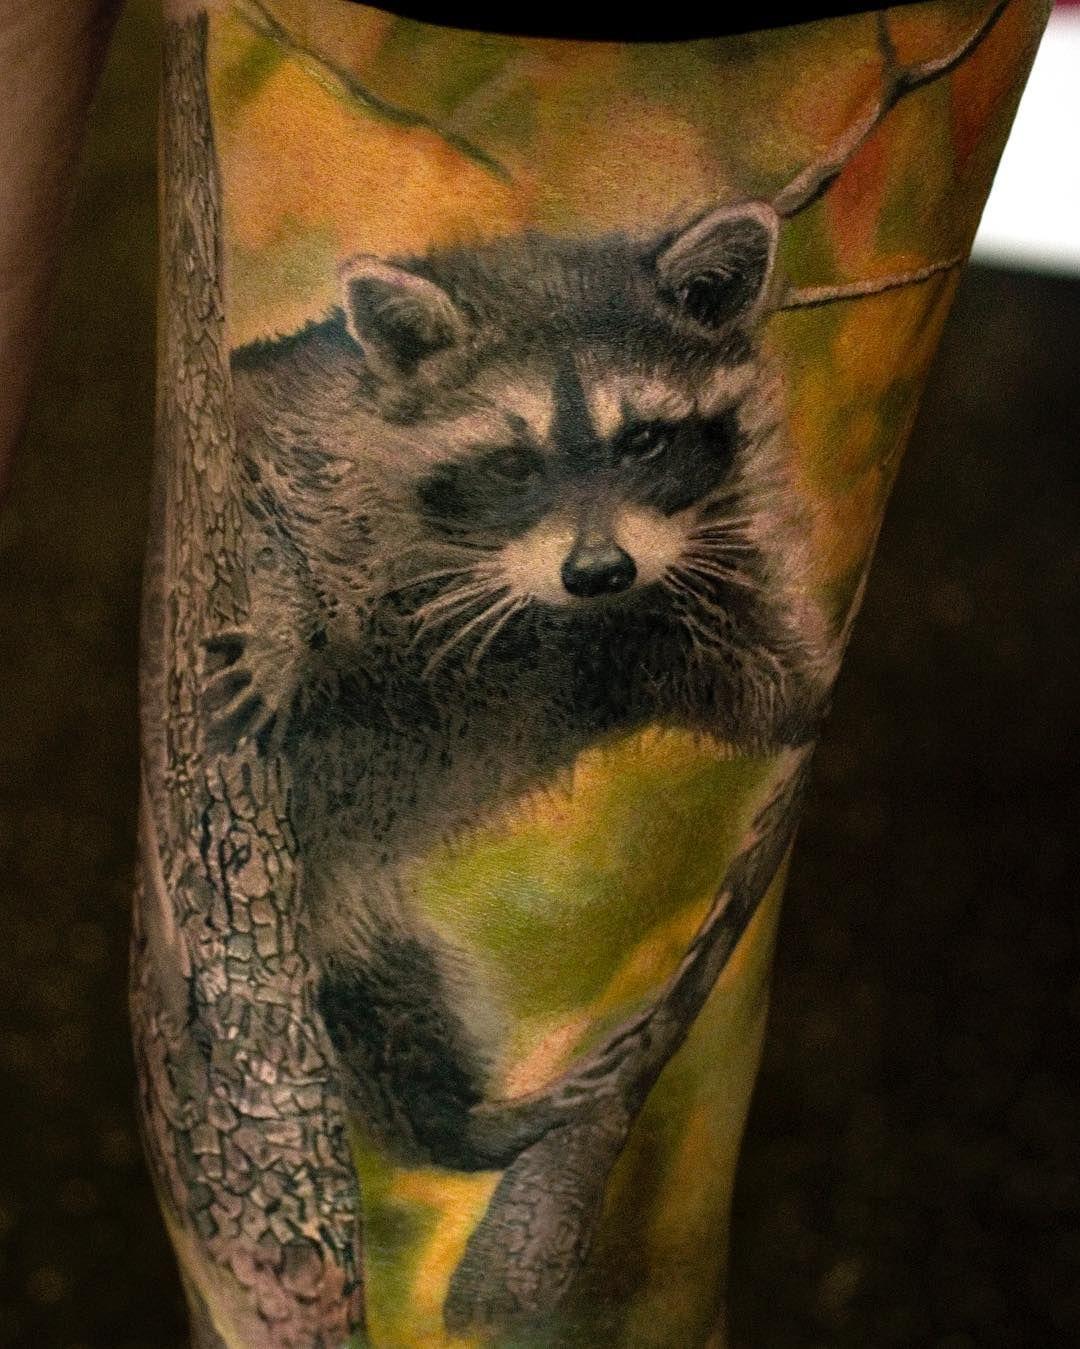 Pin by Jolanta Kelminskaite on newwwww tattoo Raccoon